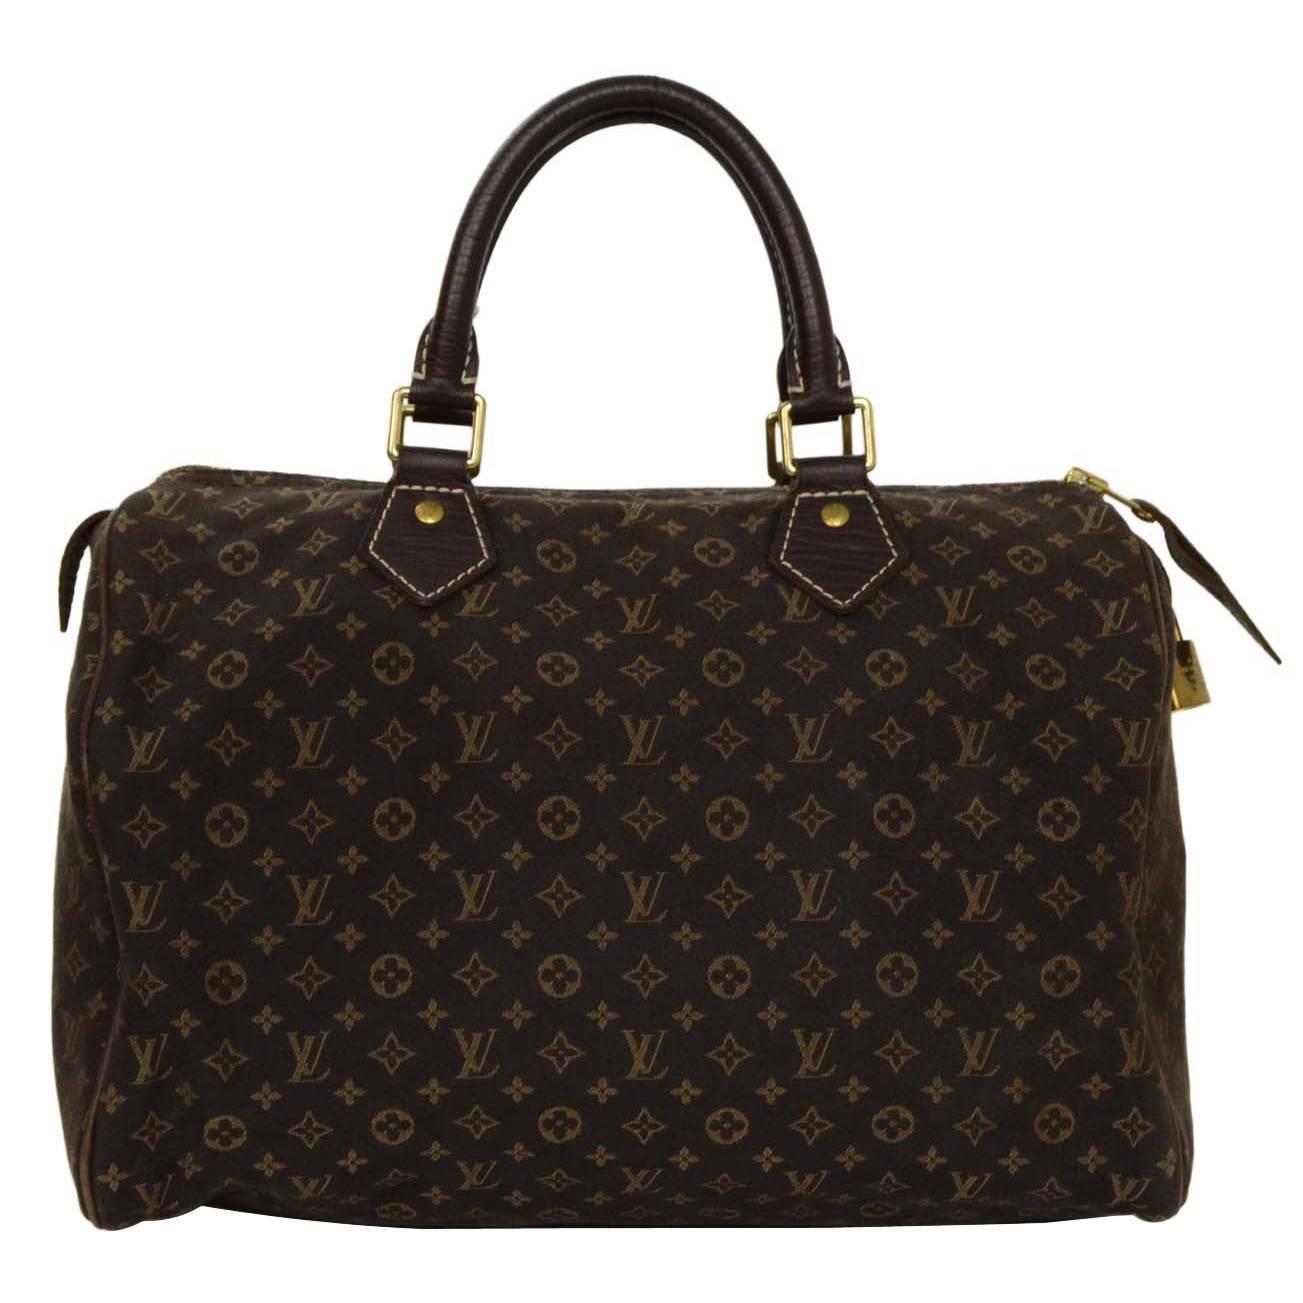 3ee3745eabf8 Louis Vuitton M41533 Speedy 30 Monogram V Tote Bag Monogram Canvas ...